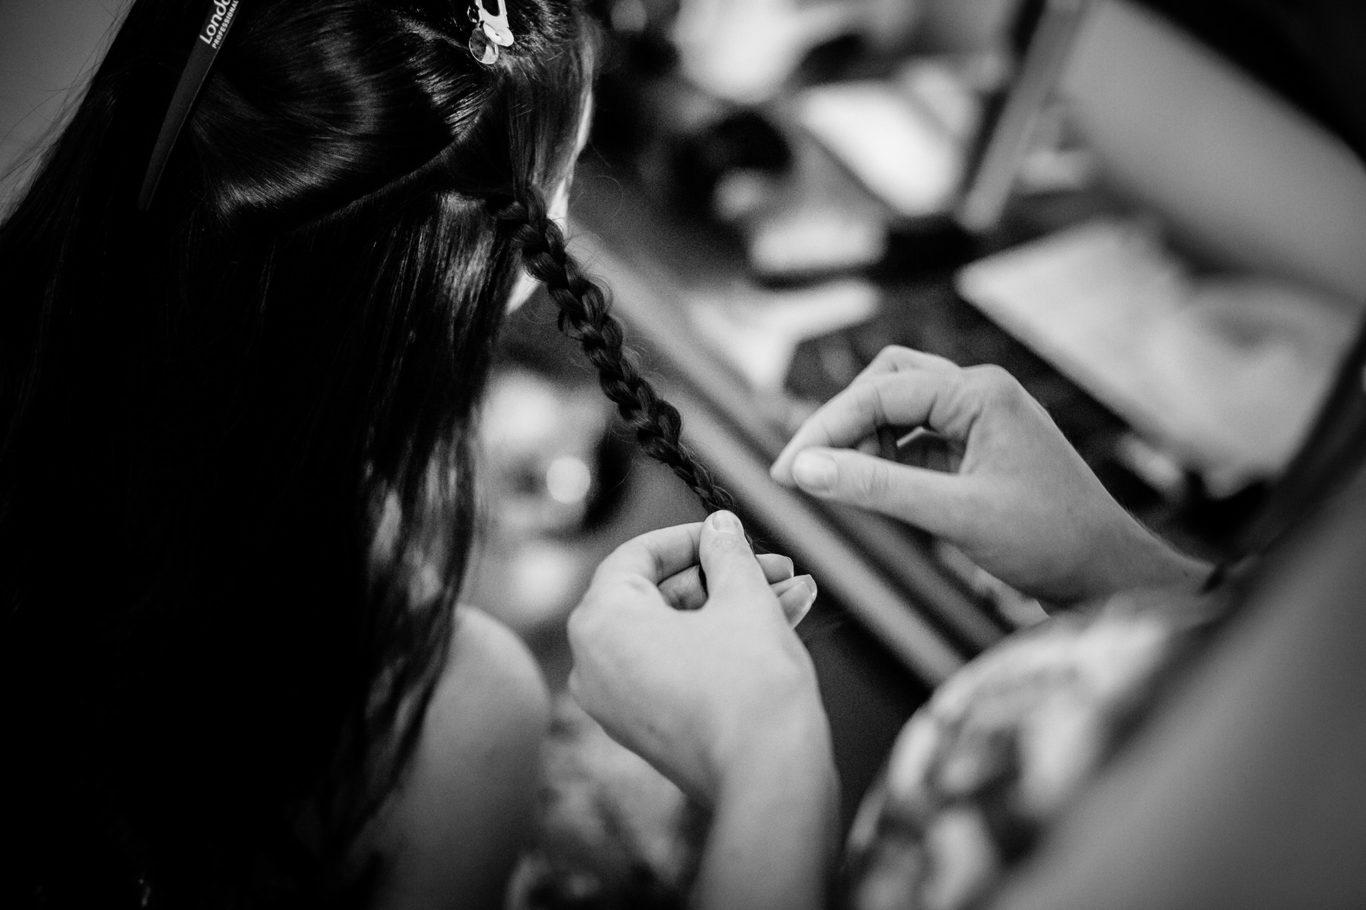 0015-fotografie-nunta-bucuresti-cristina-nicusor-fotograf-ciprian-dumitrescu-cd2_0674